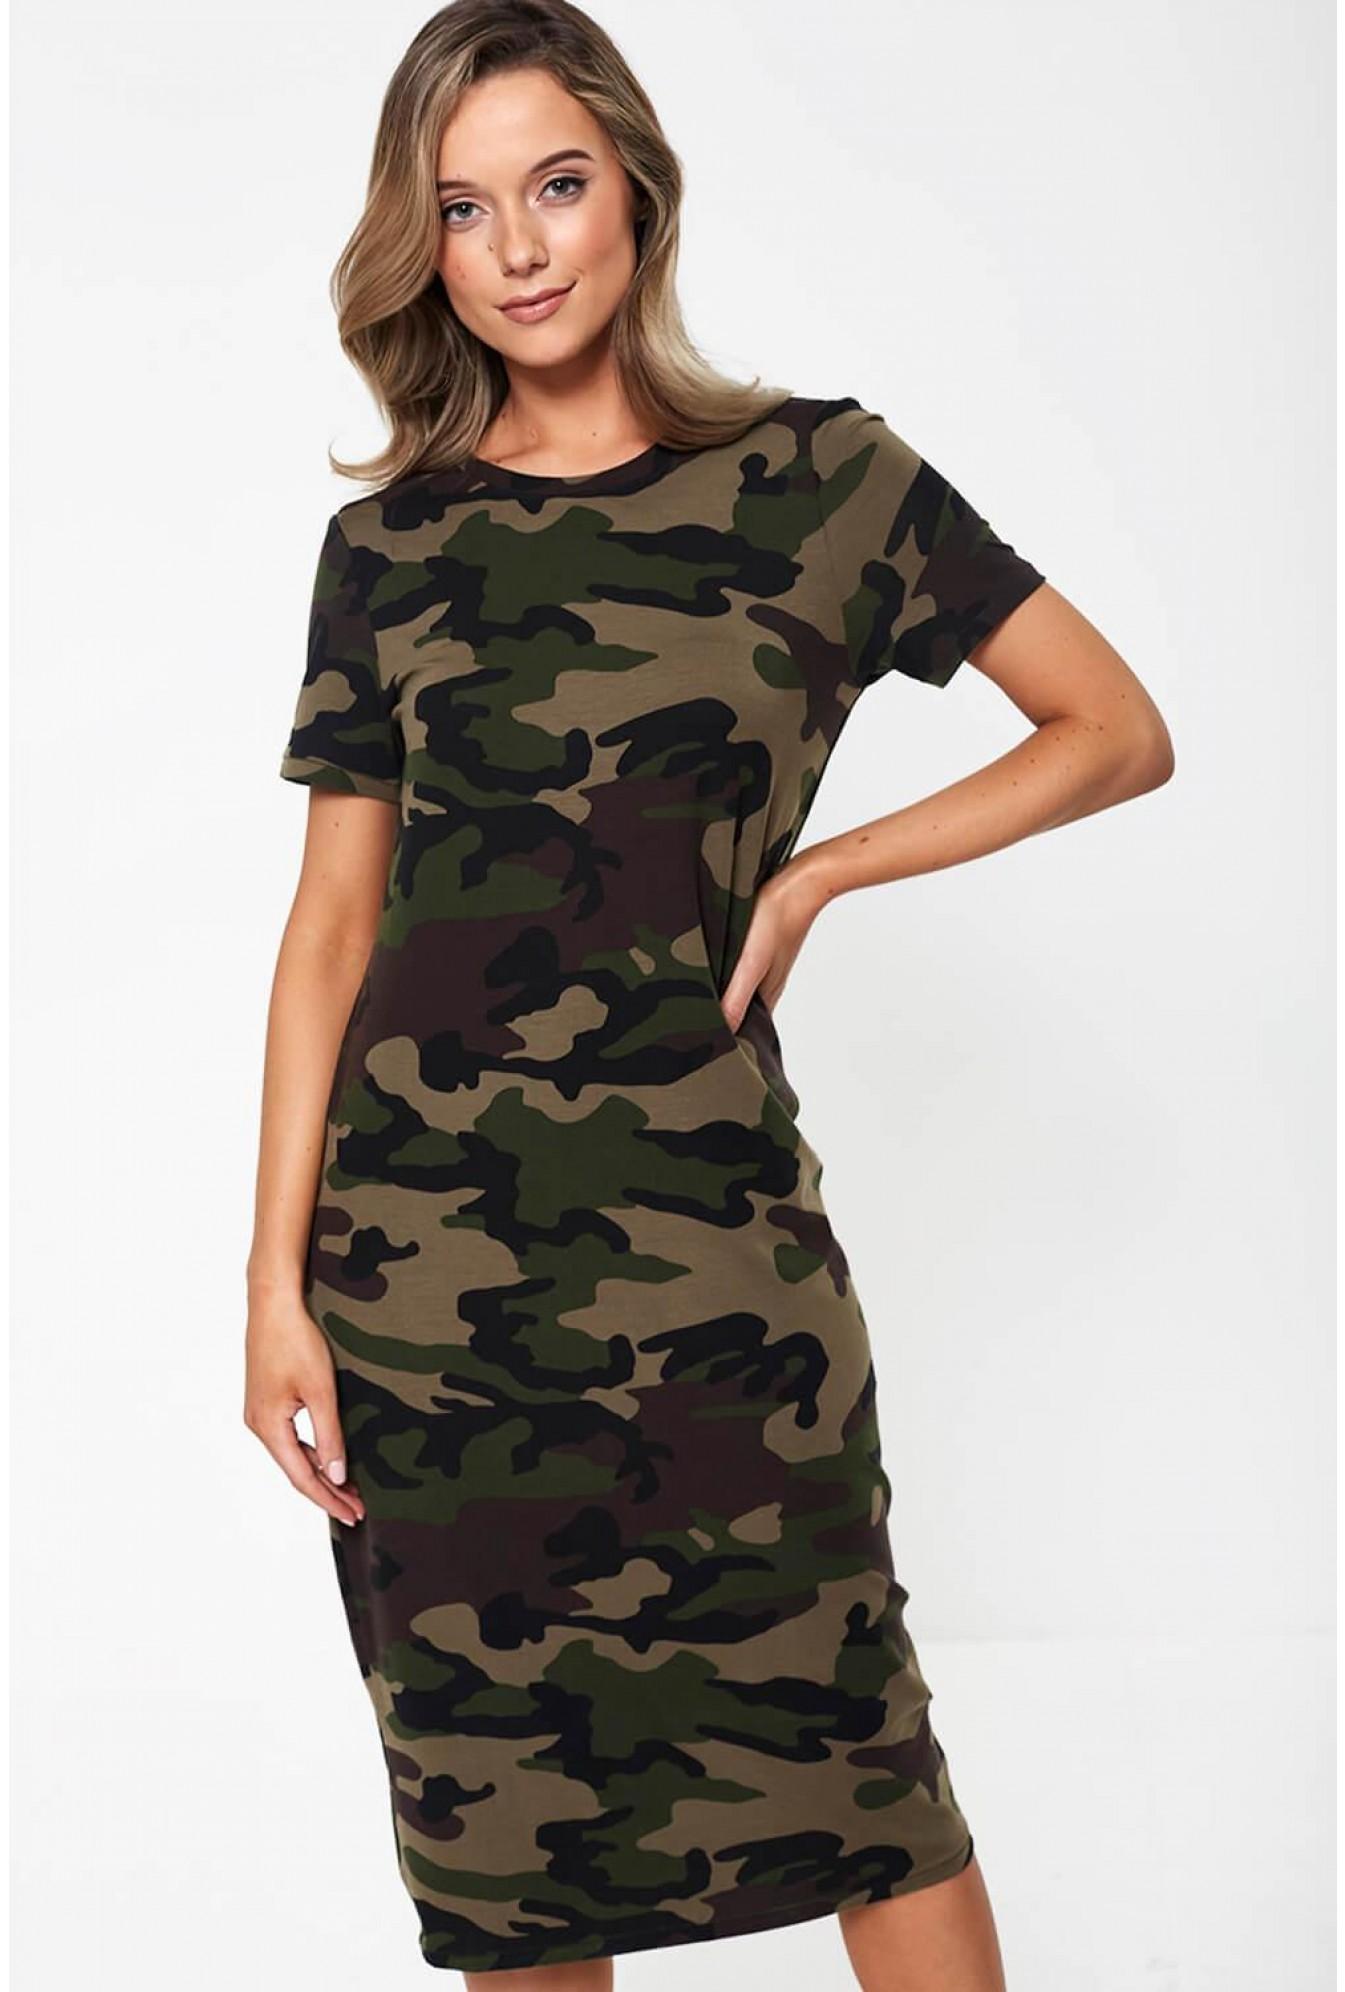 c0ece235 More Views. Gava Short Sleeve Midi Dress in Camouflage Print